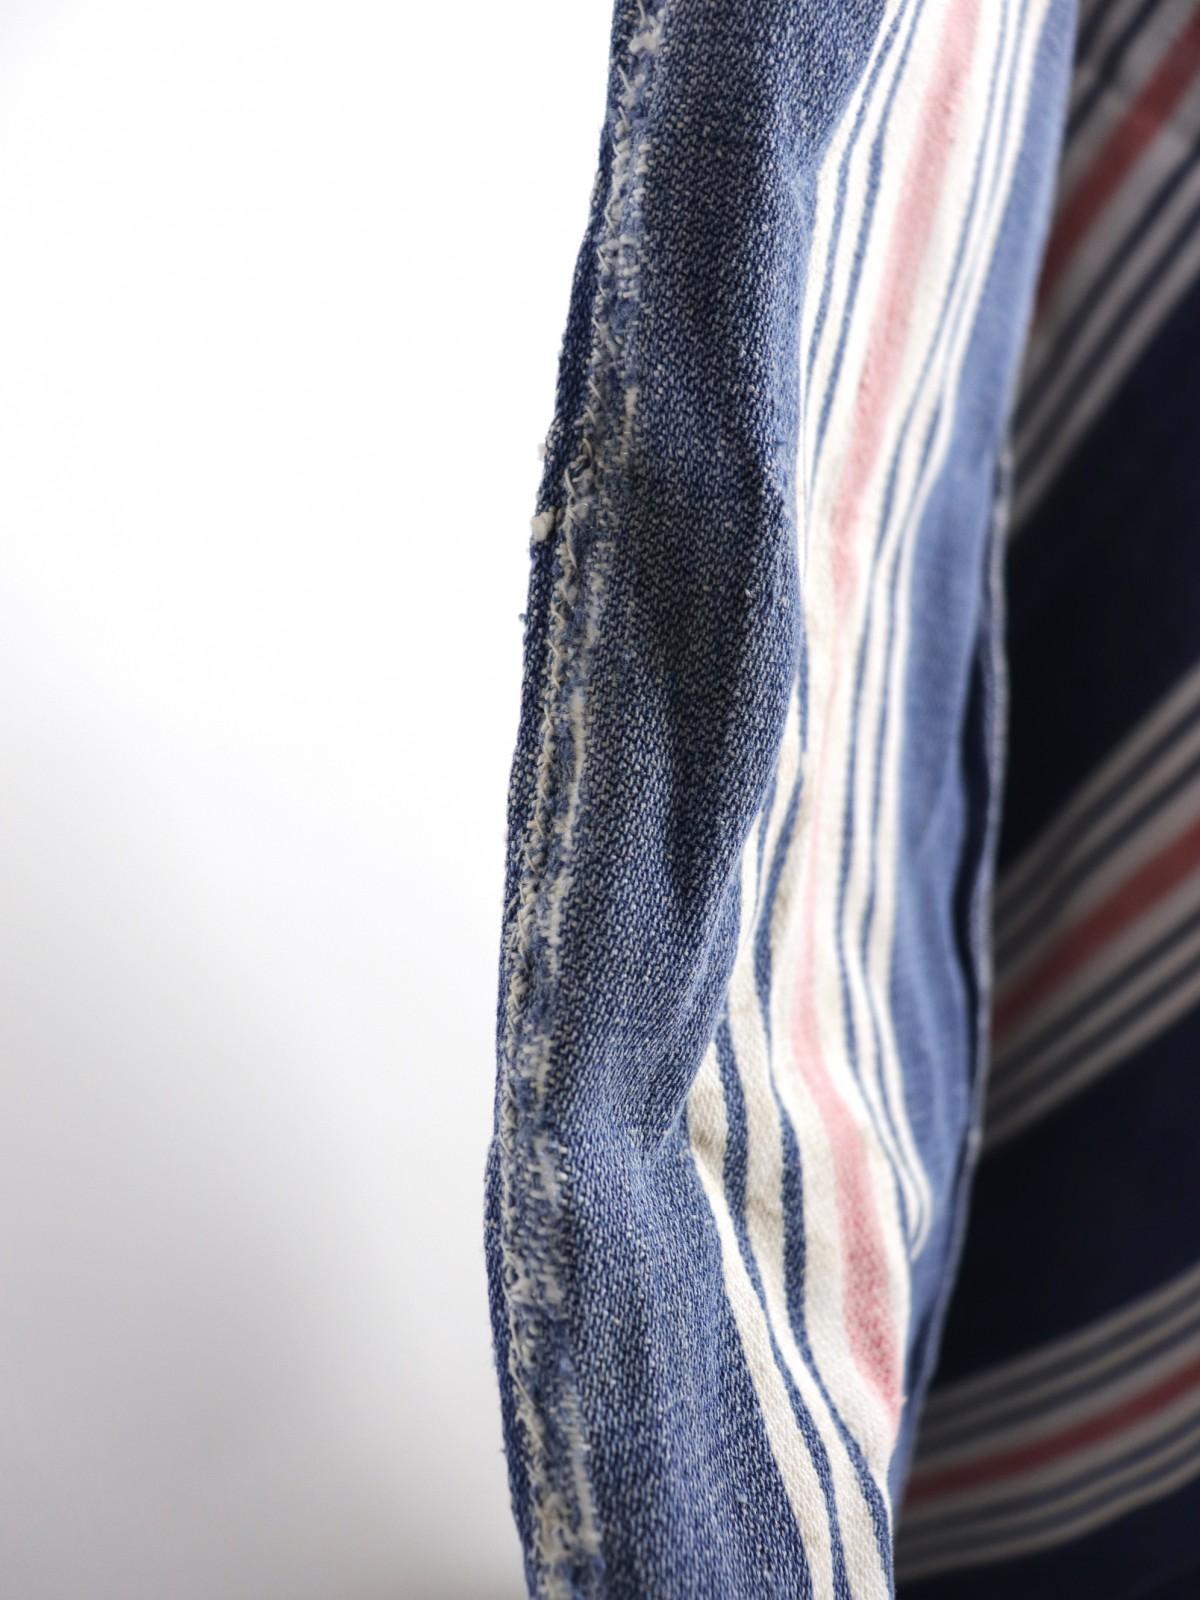 1960's, Italian cotton fabric, upholstery fabric, Italy